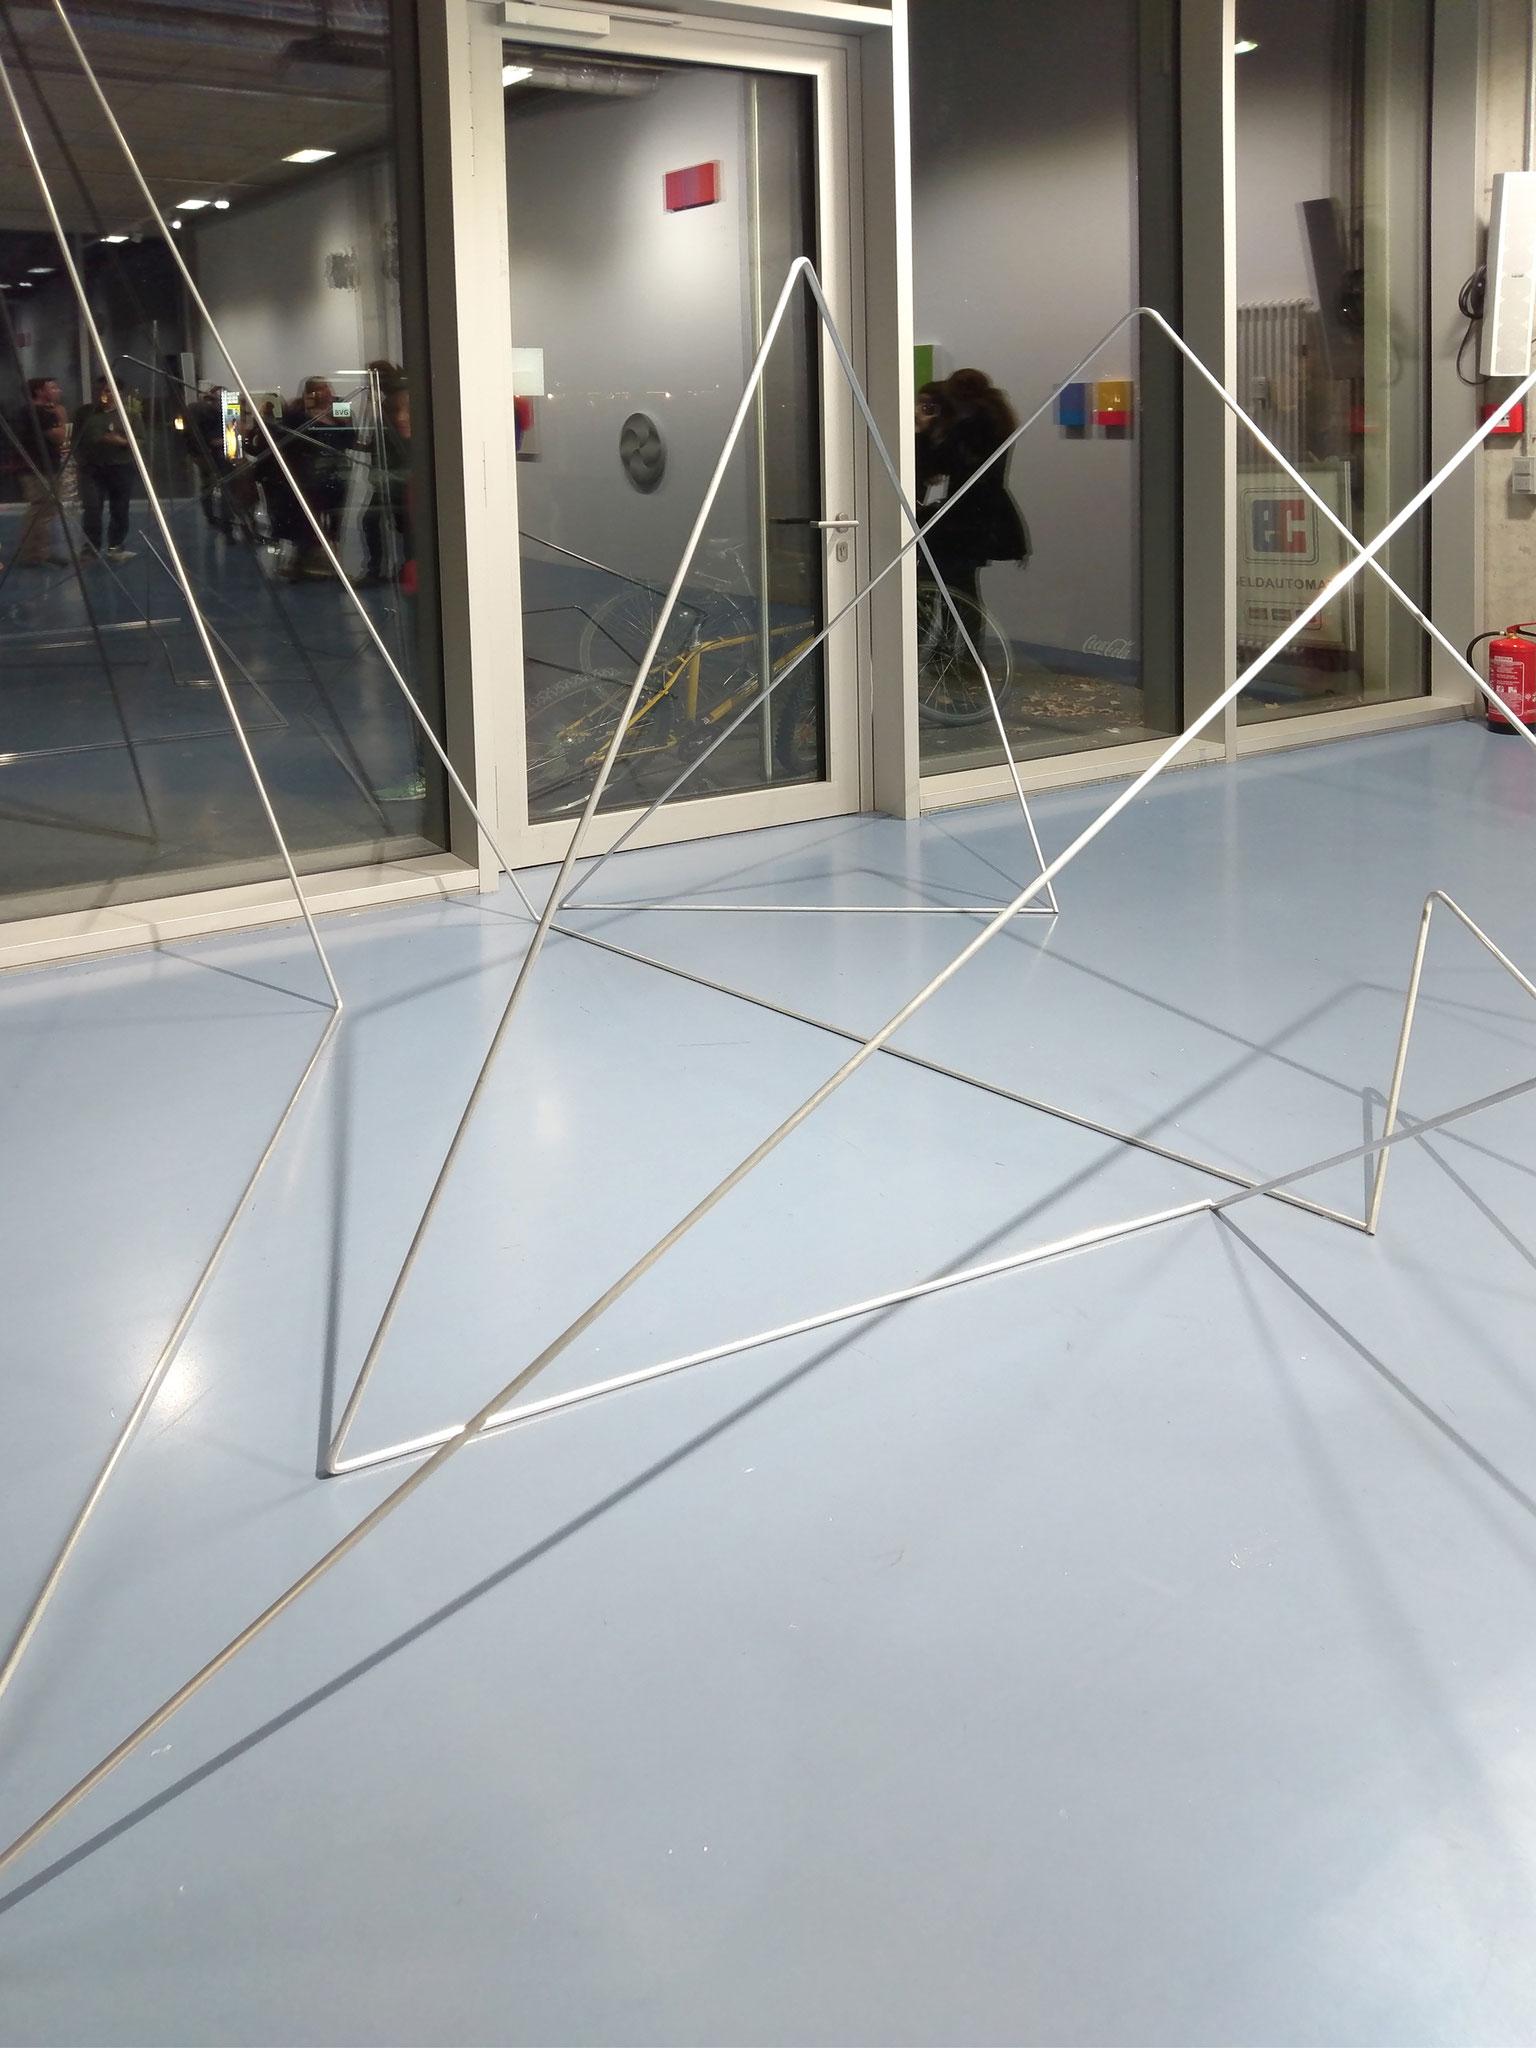 folded lines 02, Aluminiumstab je 600 cm, the flying field , Aufbauhaus Berlin